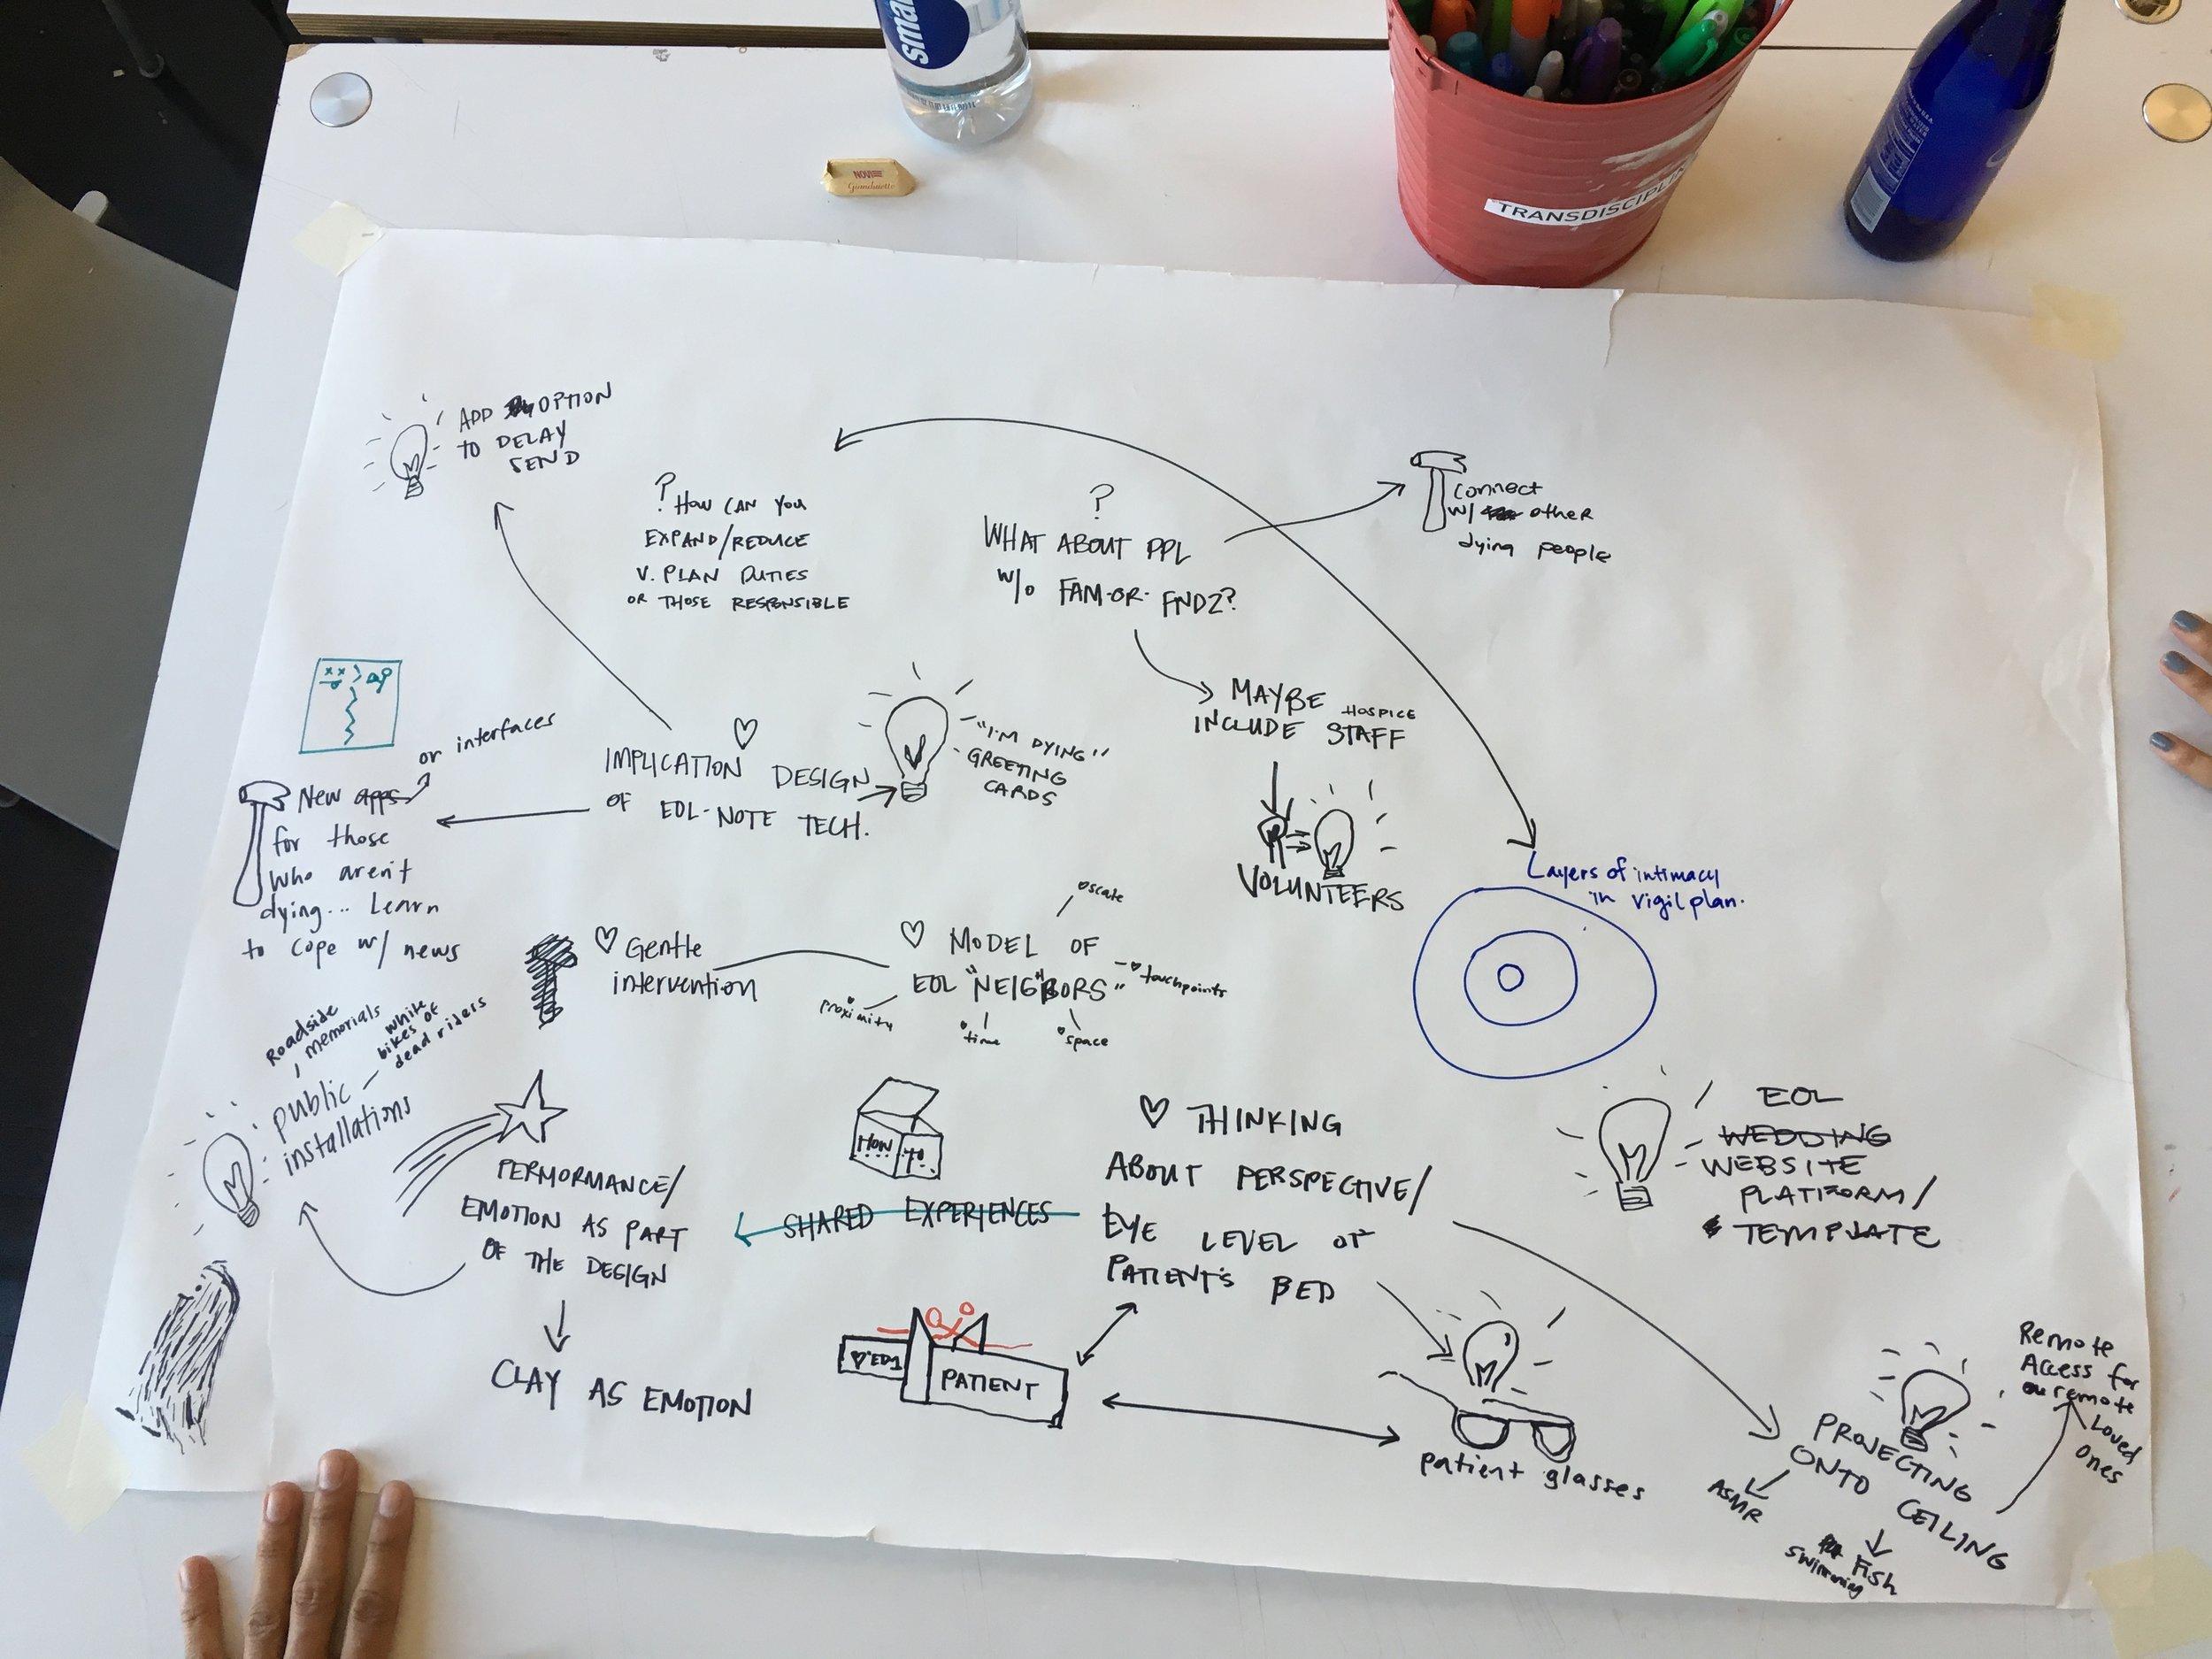 Designing for End-of-Life Care: Concepting Workshop